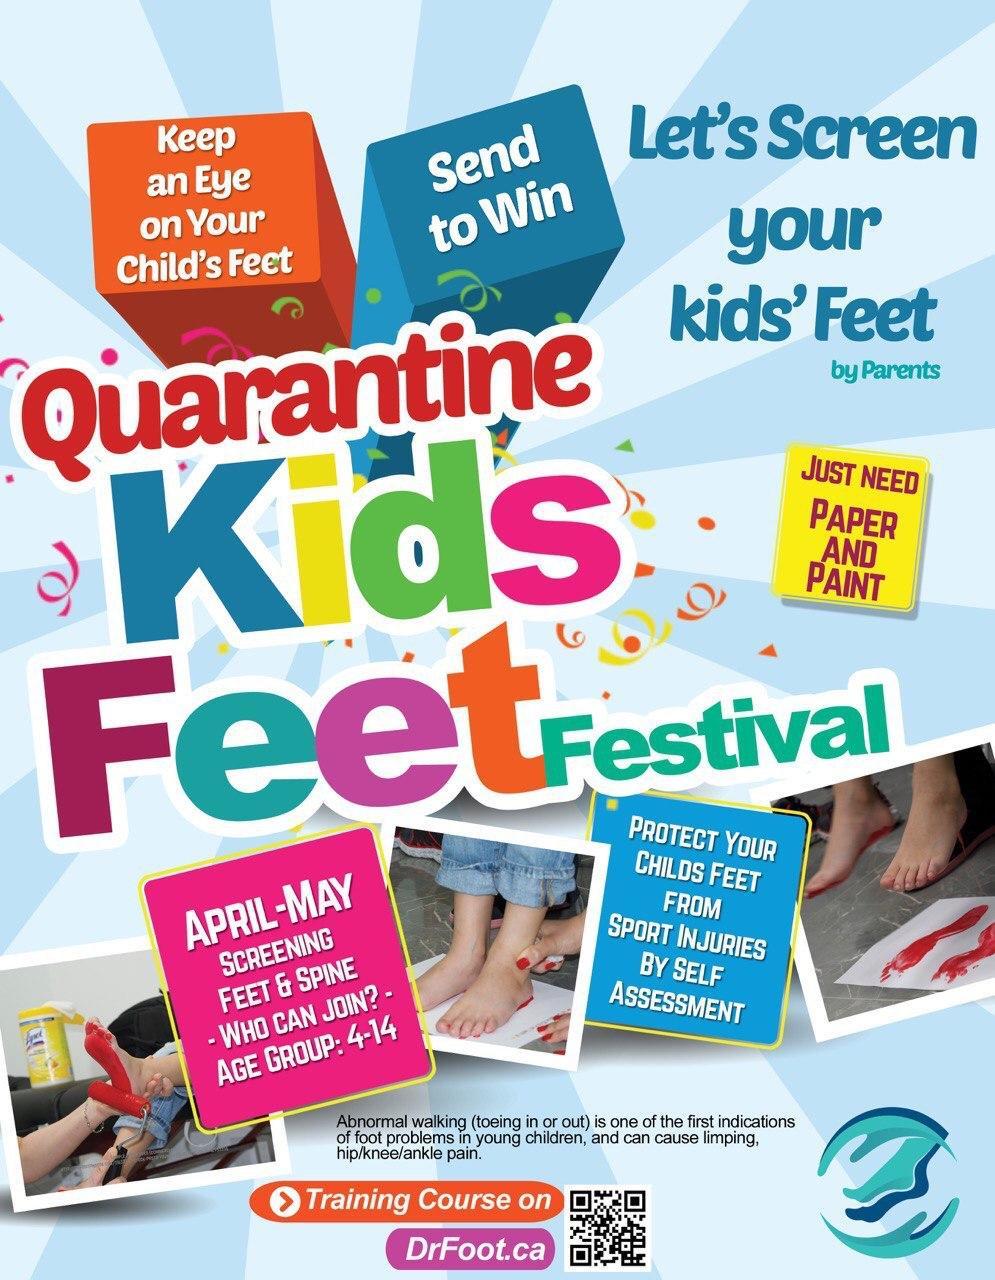 Quarantine is best time for Self-screening kids' feet disorders